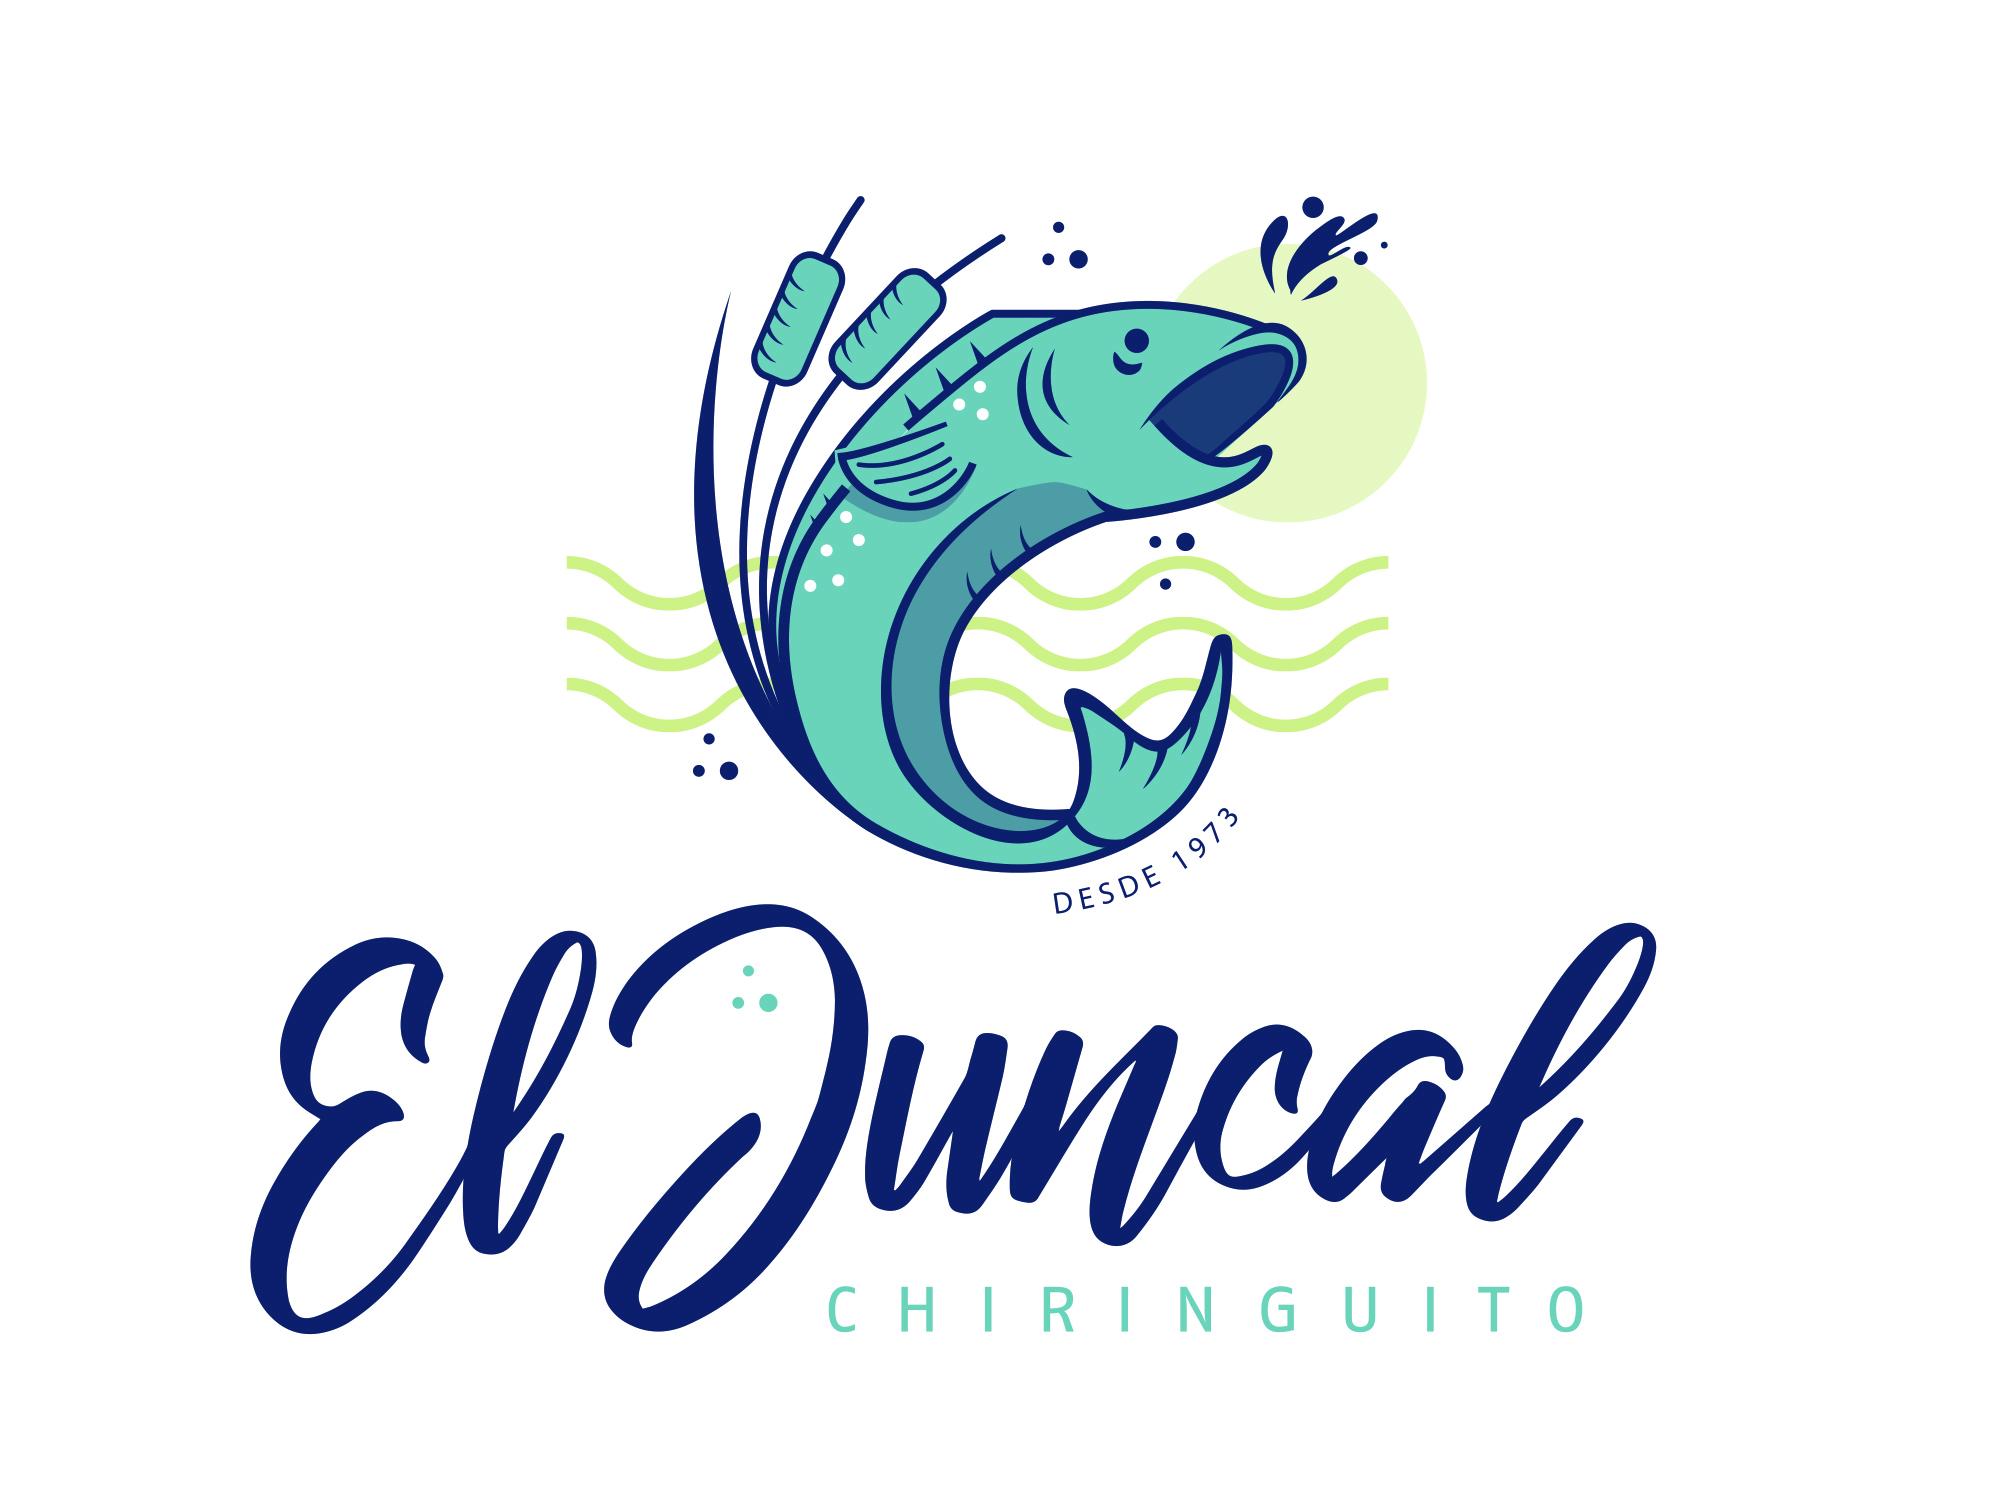 Chiringuito El Juncal